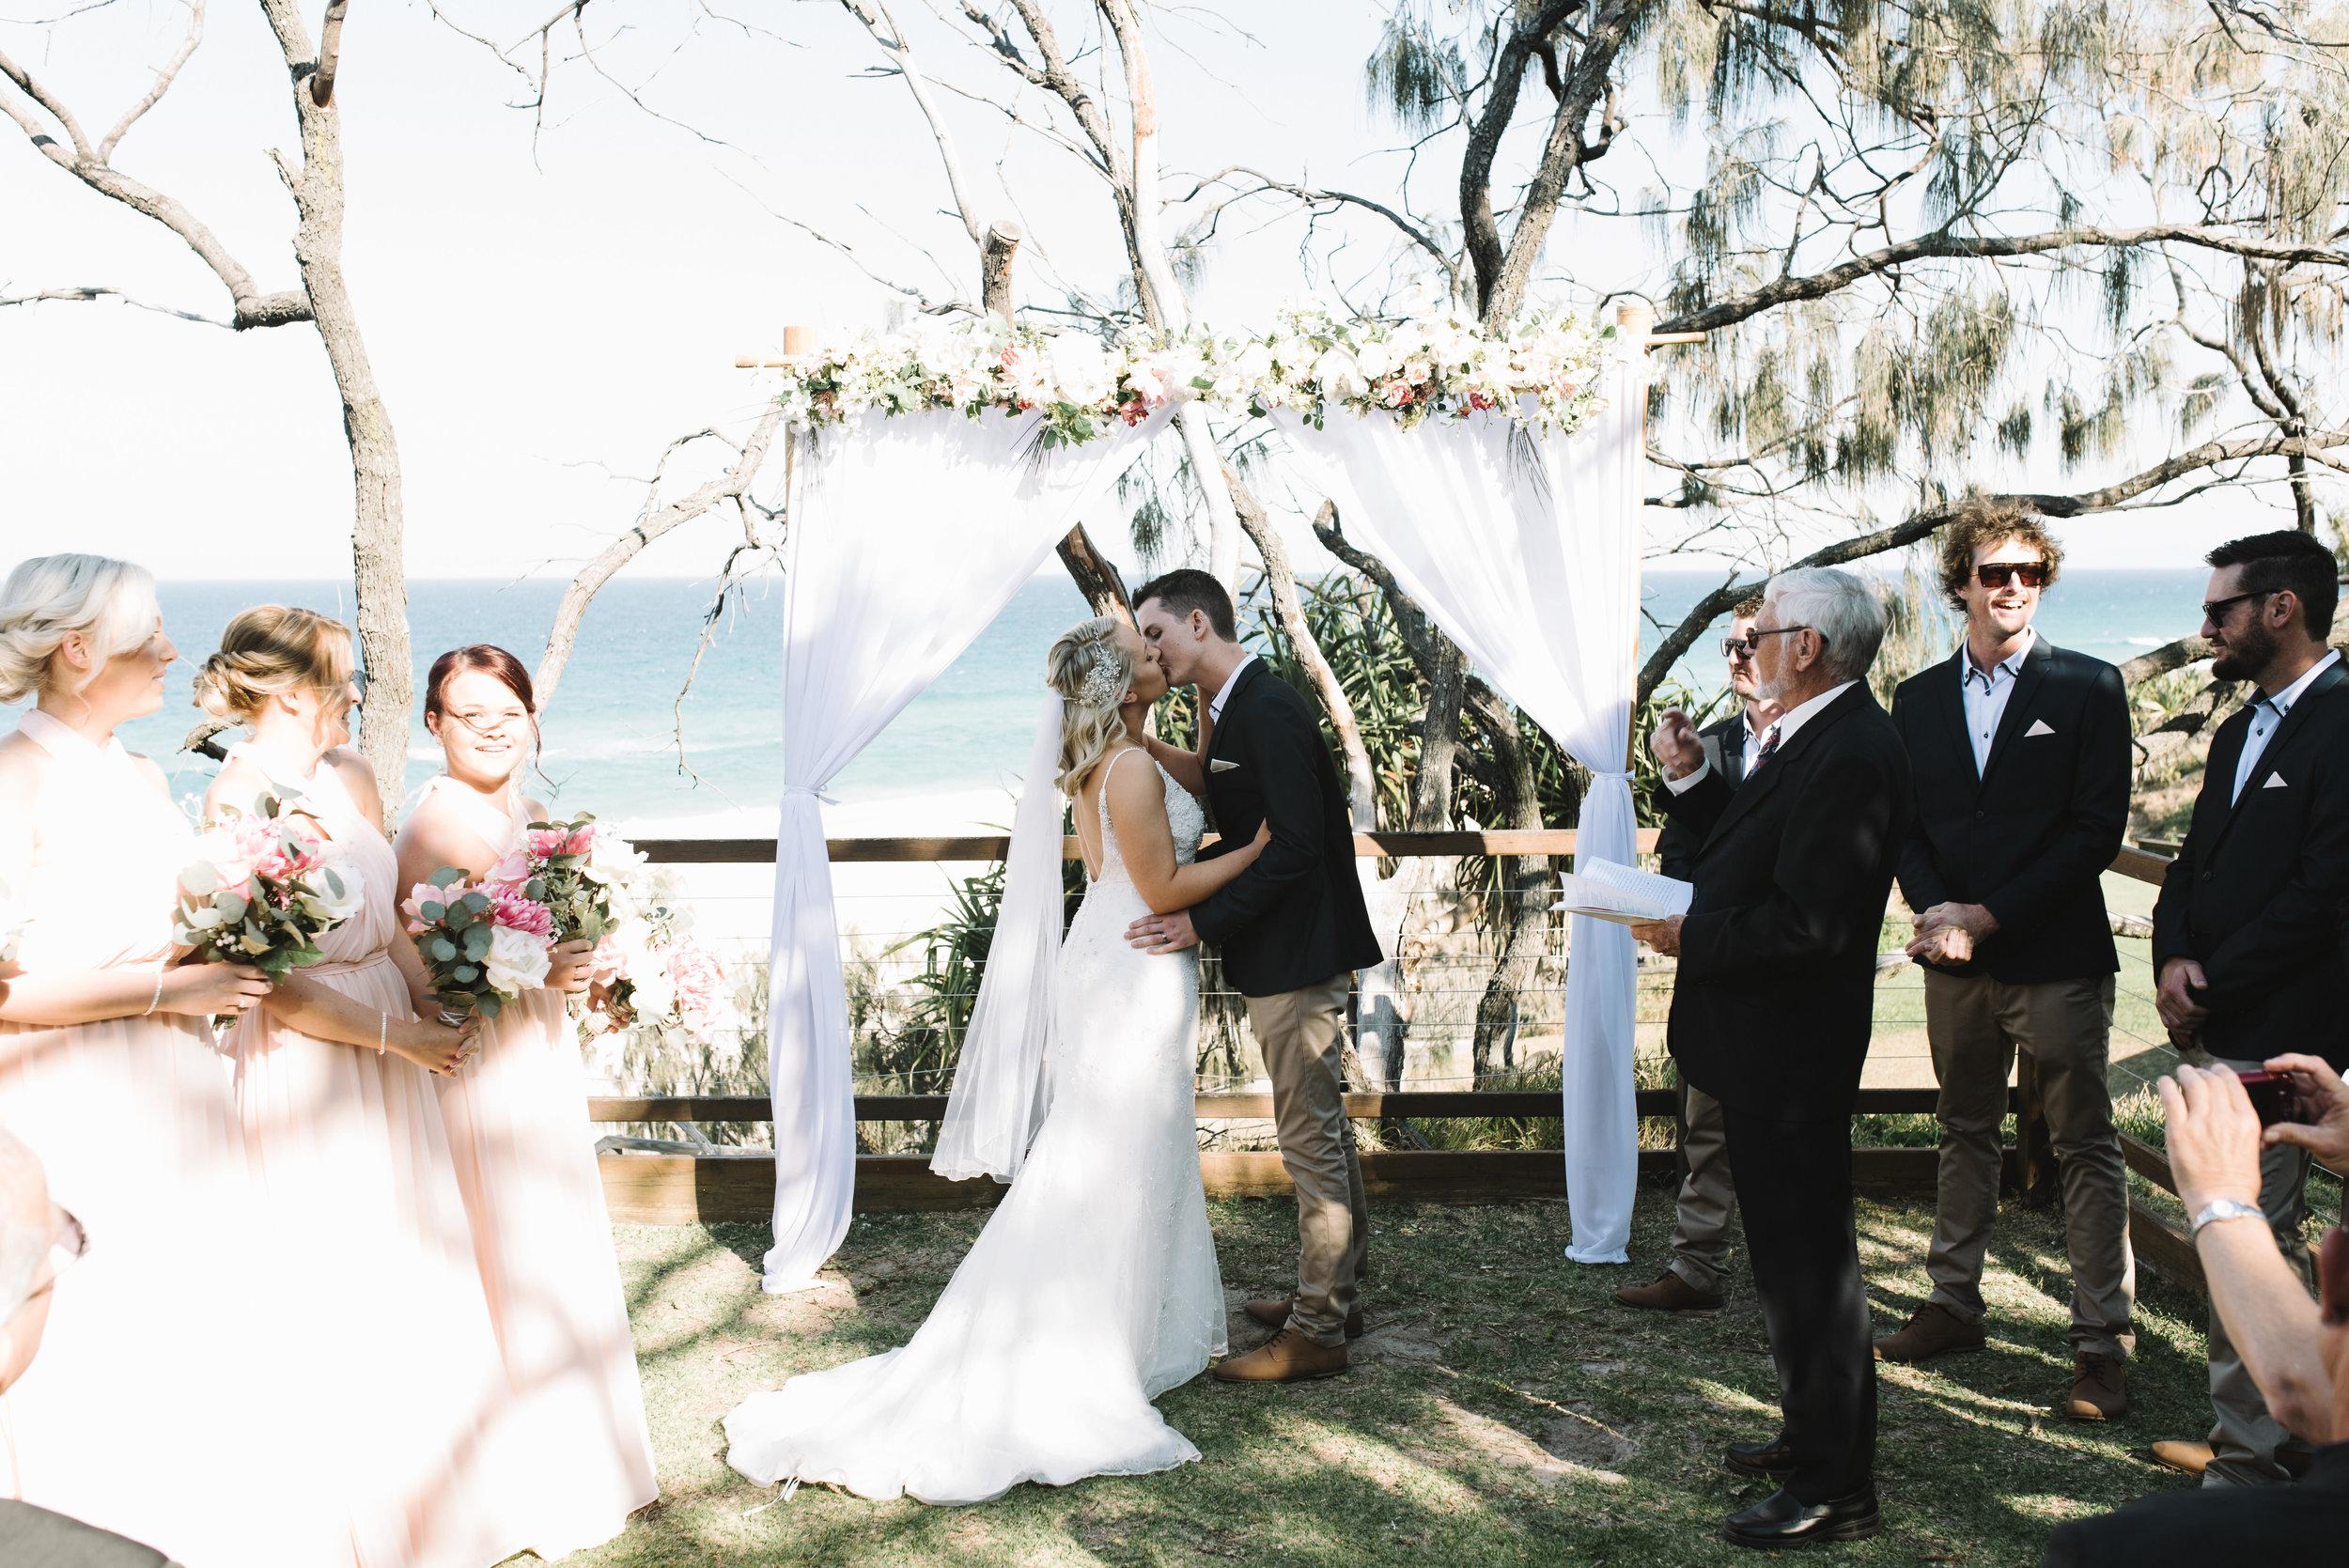 sunshine-coast-wedding-photography-44.jpg